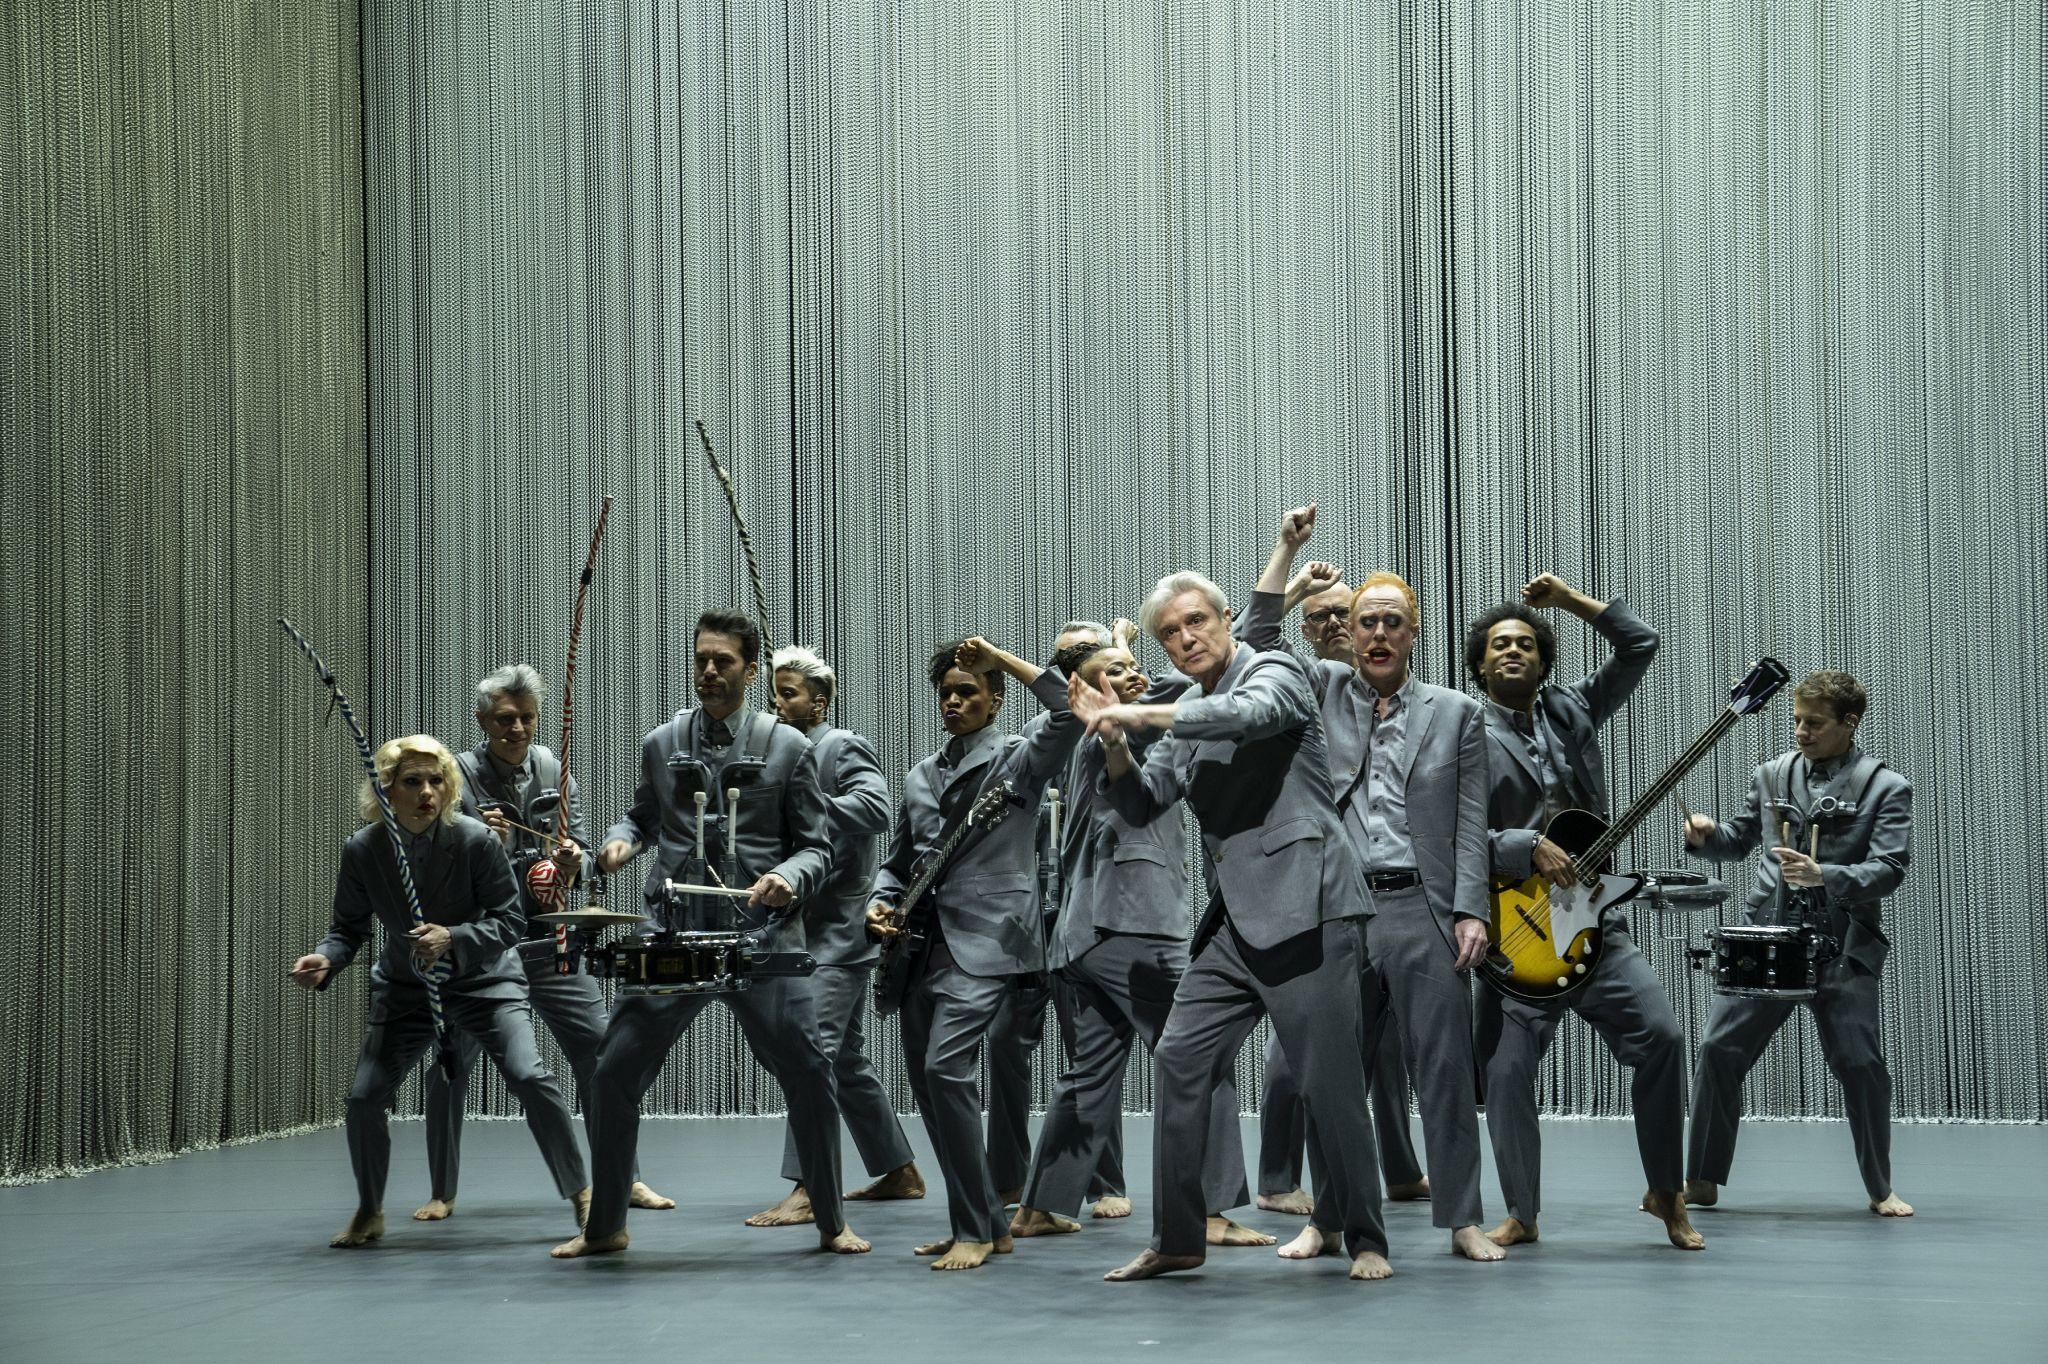 Zomerfilmhuis: David Byrne's American Utopia